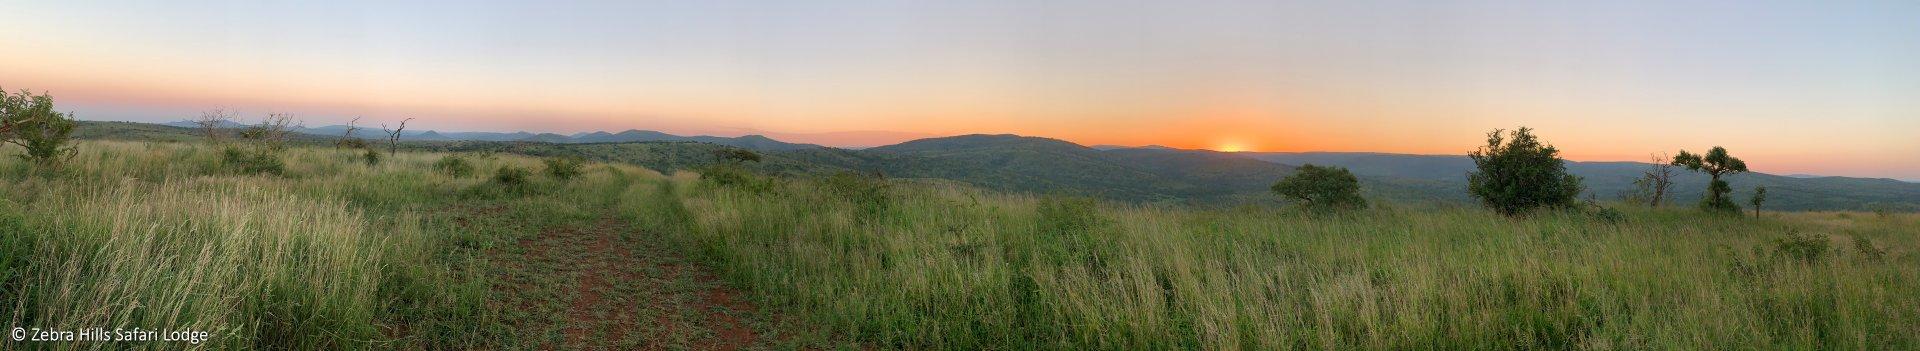 Manyoni Private Game Reserve Scenery - Zebra Hills Safari Lodge